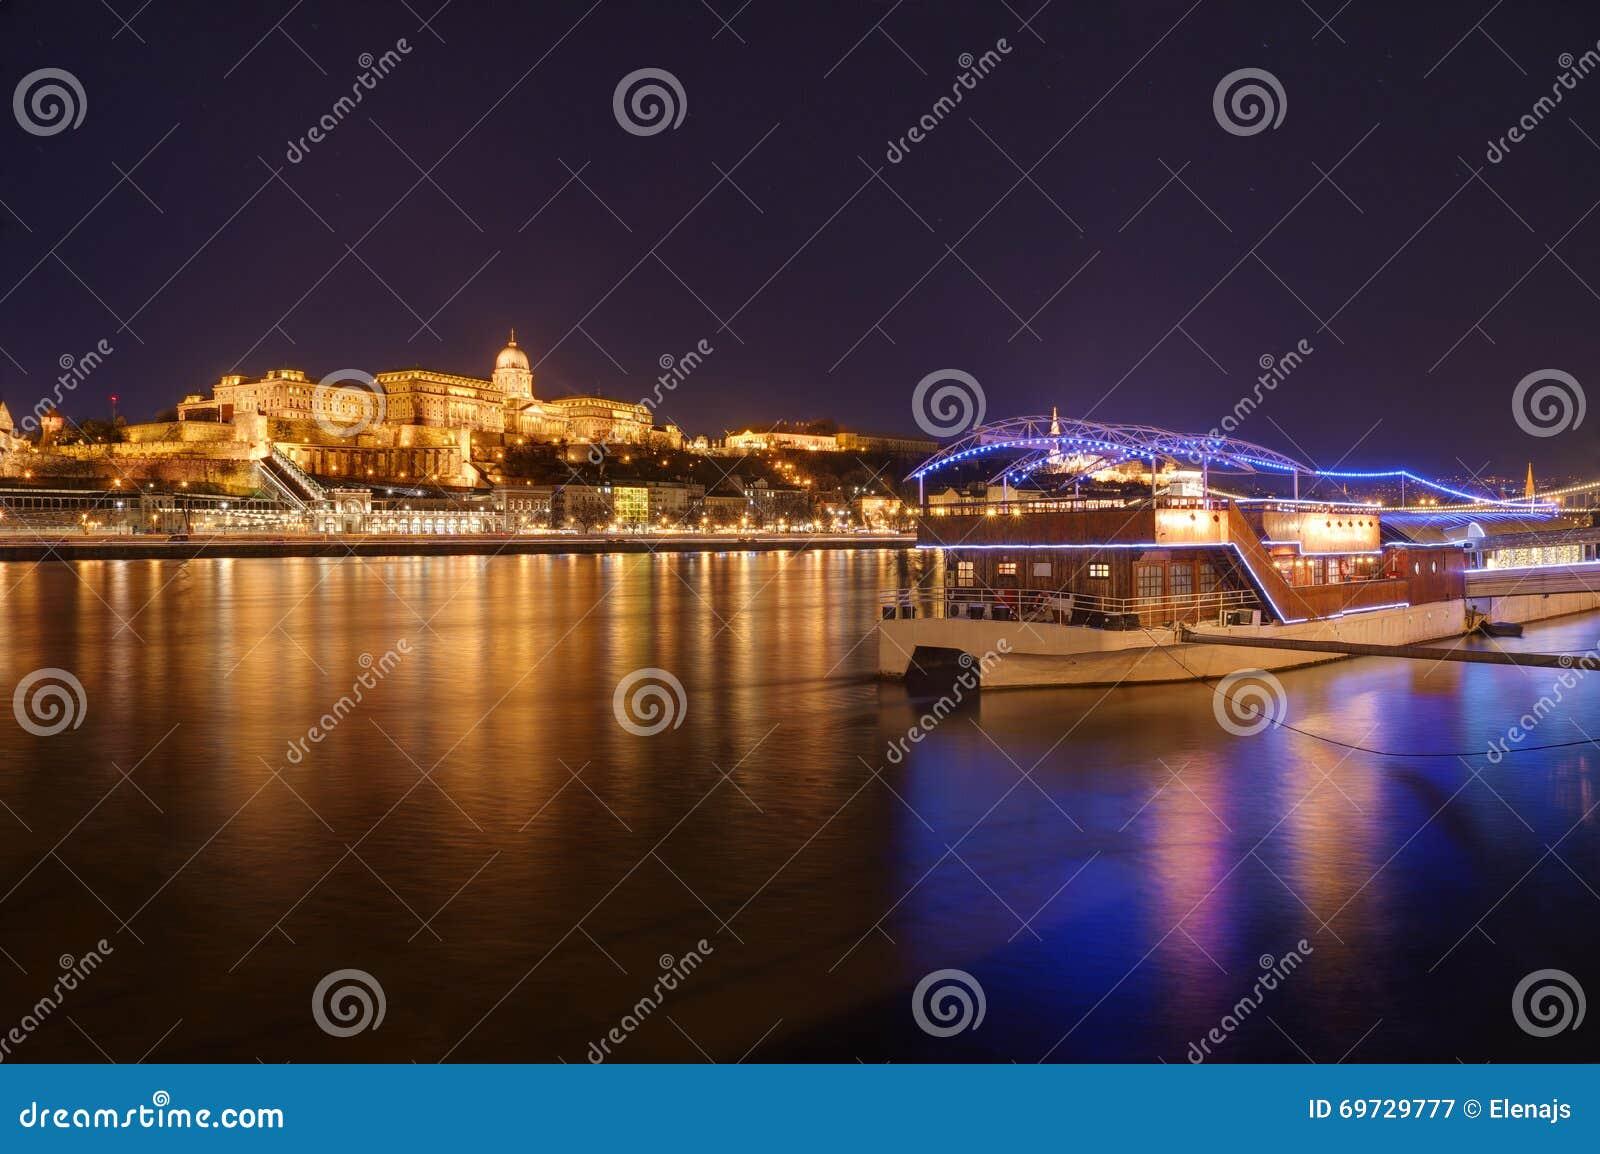 Ungarn, Budapest, Schloss Buda - Nachtbild